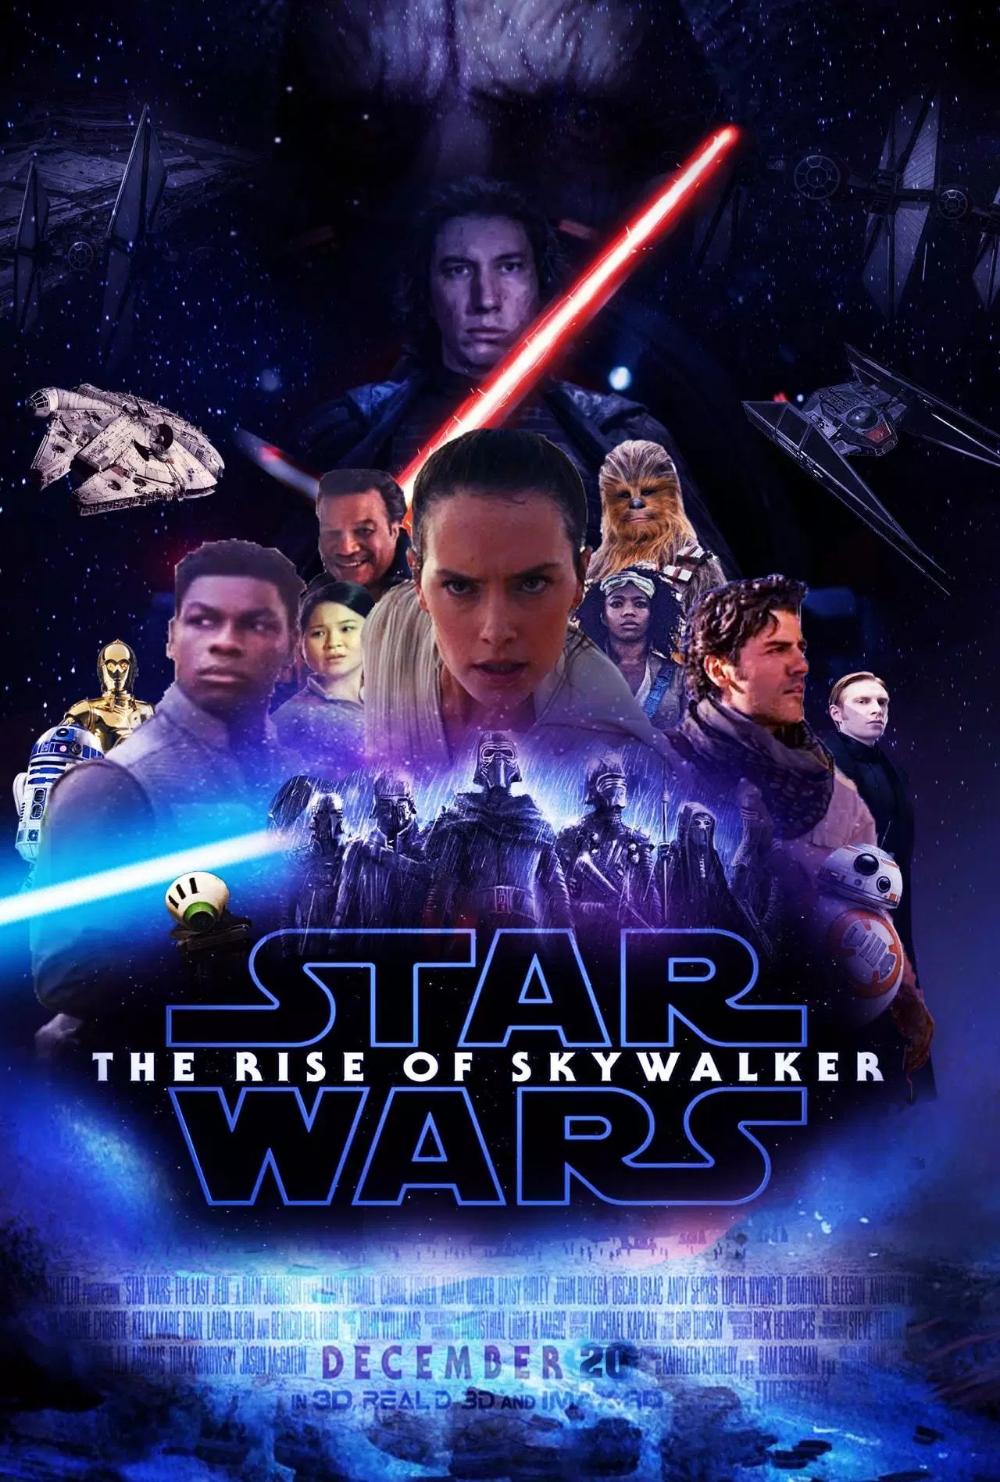 Watch Star Wars The Rise Of Skywalker Online Full 2019 Movie Hd Free Engsub Starwars In 2020 Star Wars Episodes Star Wars Movies Posters Star Wars Watch